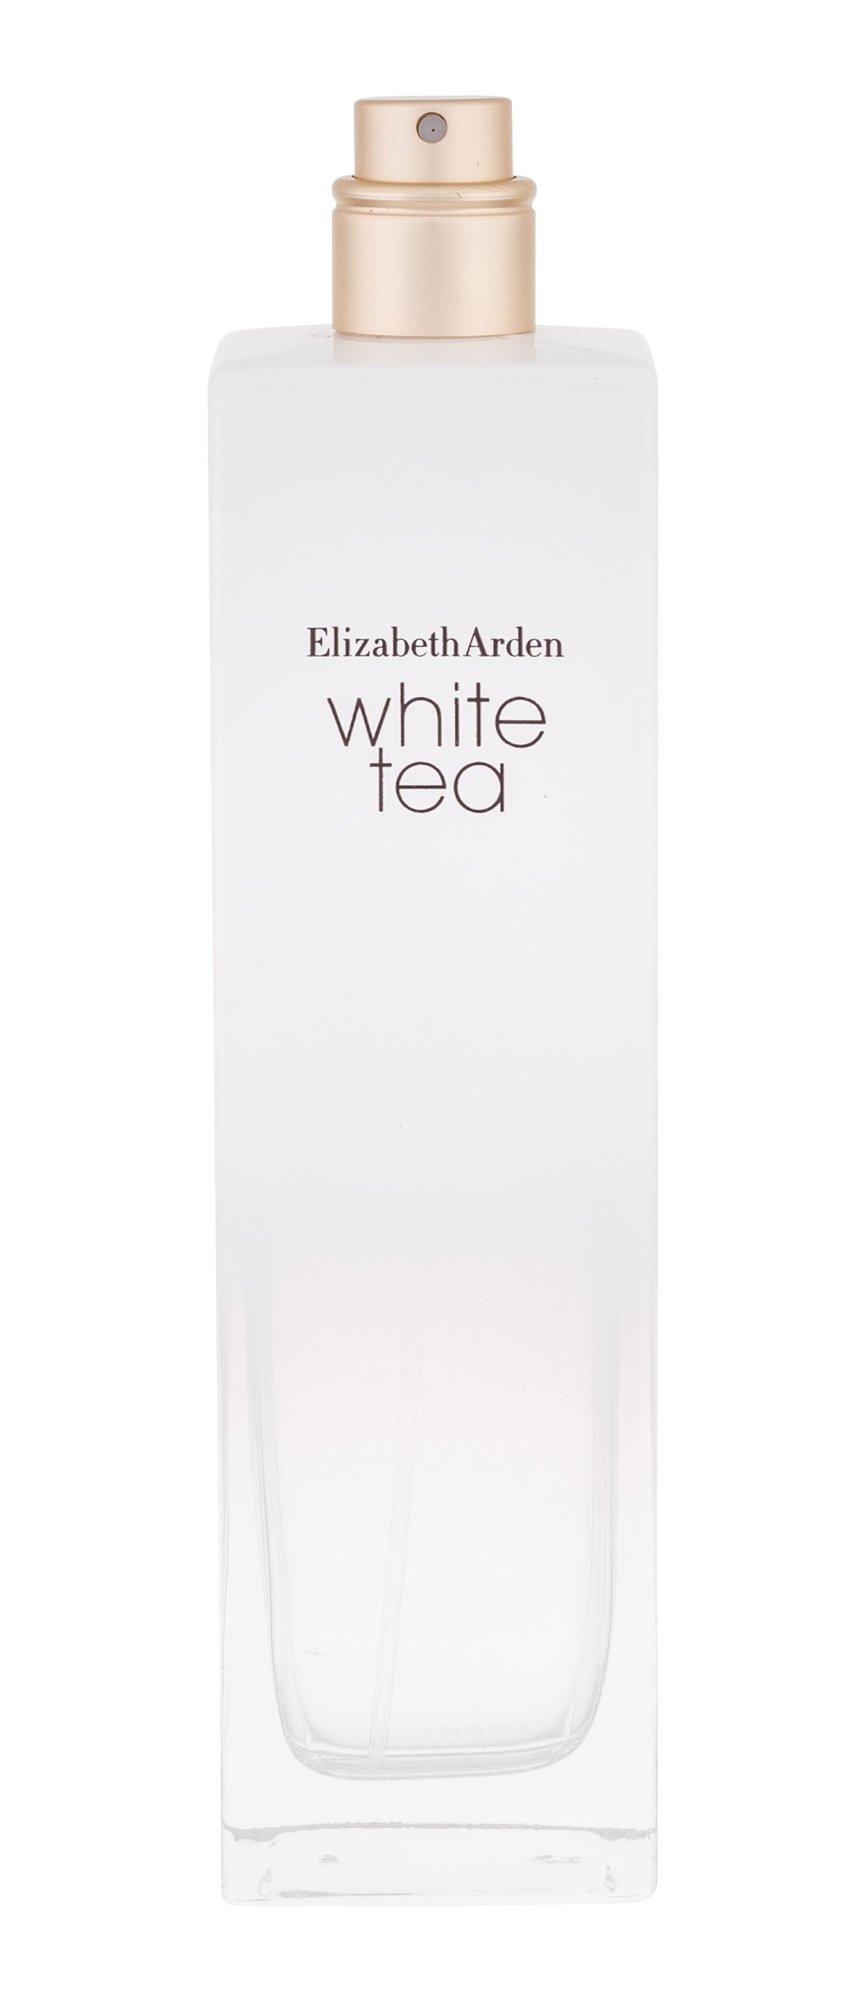 Elizabeth Arden White Tea, Toaletná voda 100ml, Tester